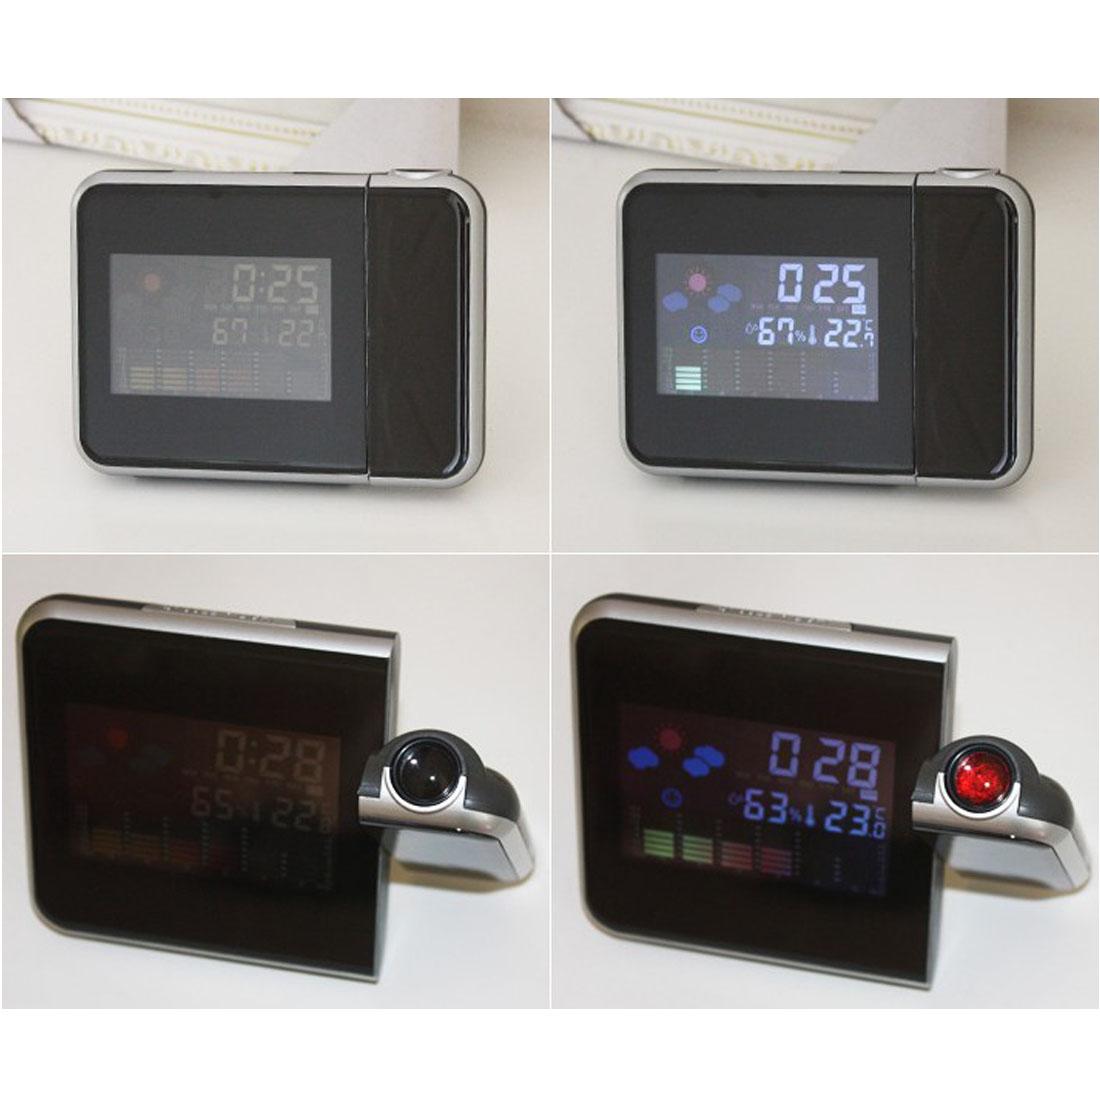 New LED Backlight Digital Weather Projection Snooze Alarm Clock Color